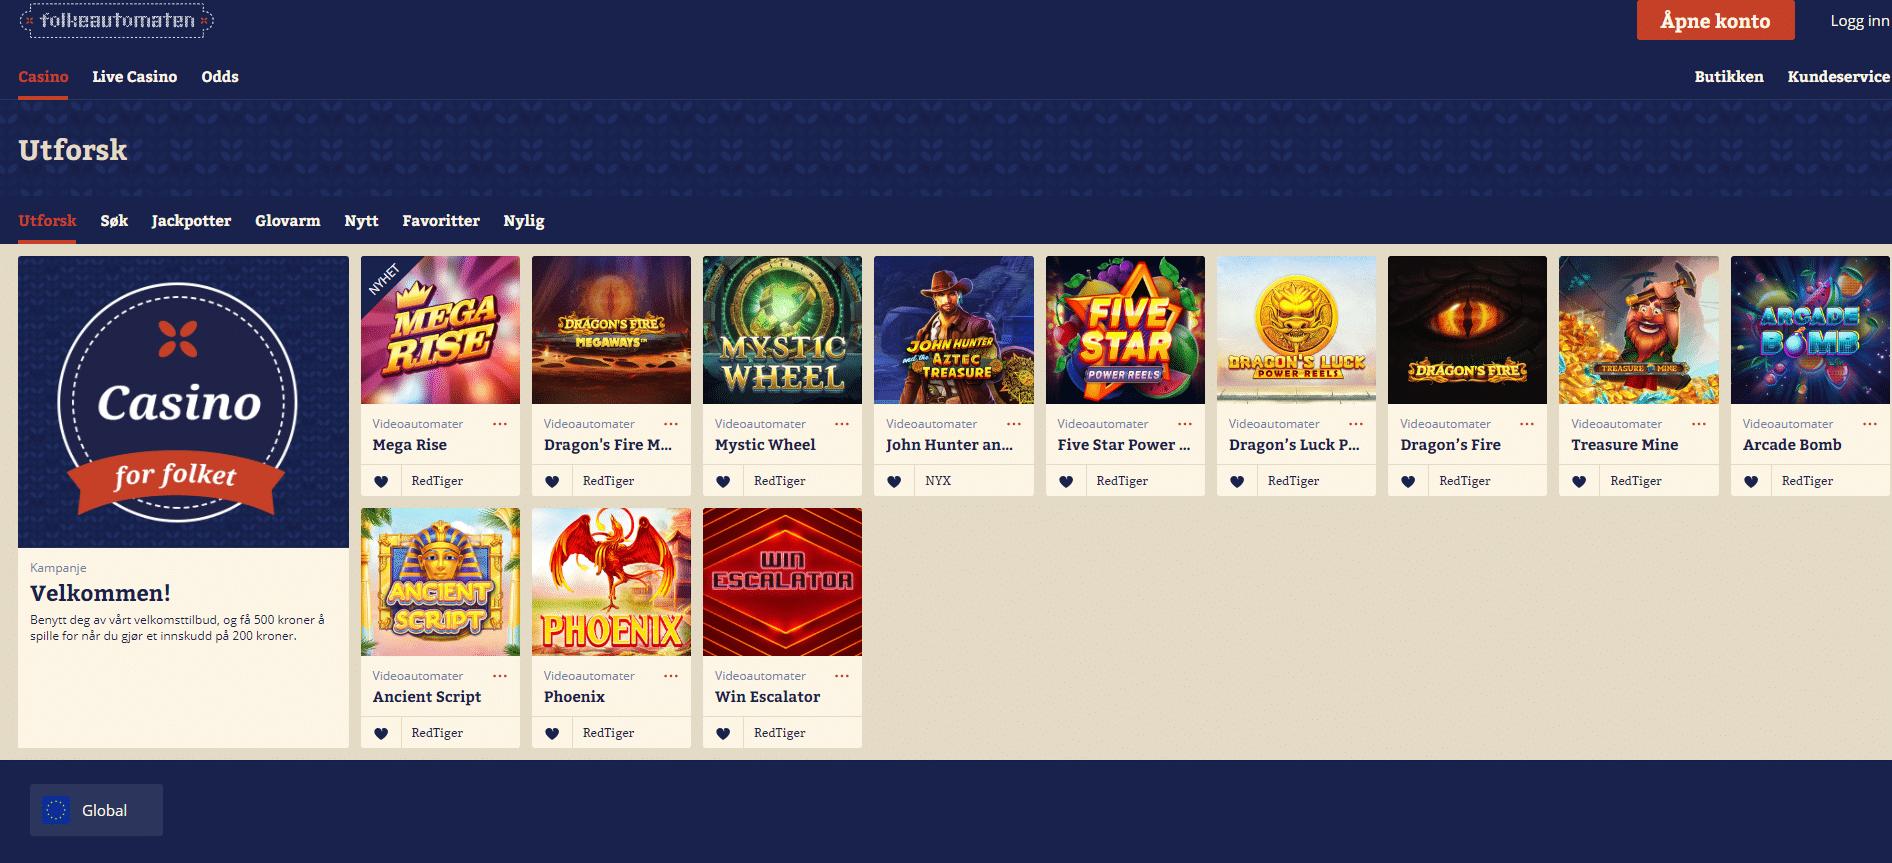 Lista casino bonusar holdem